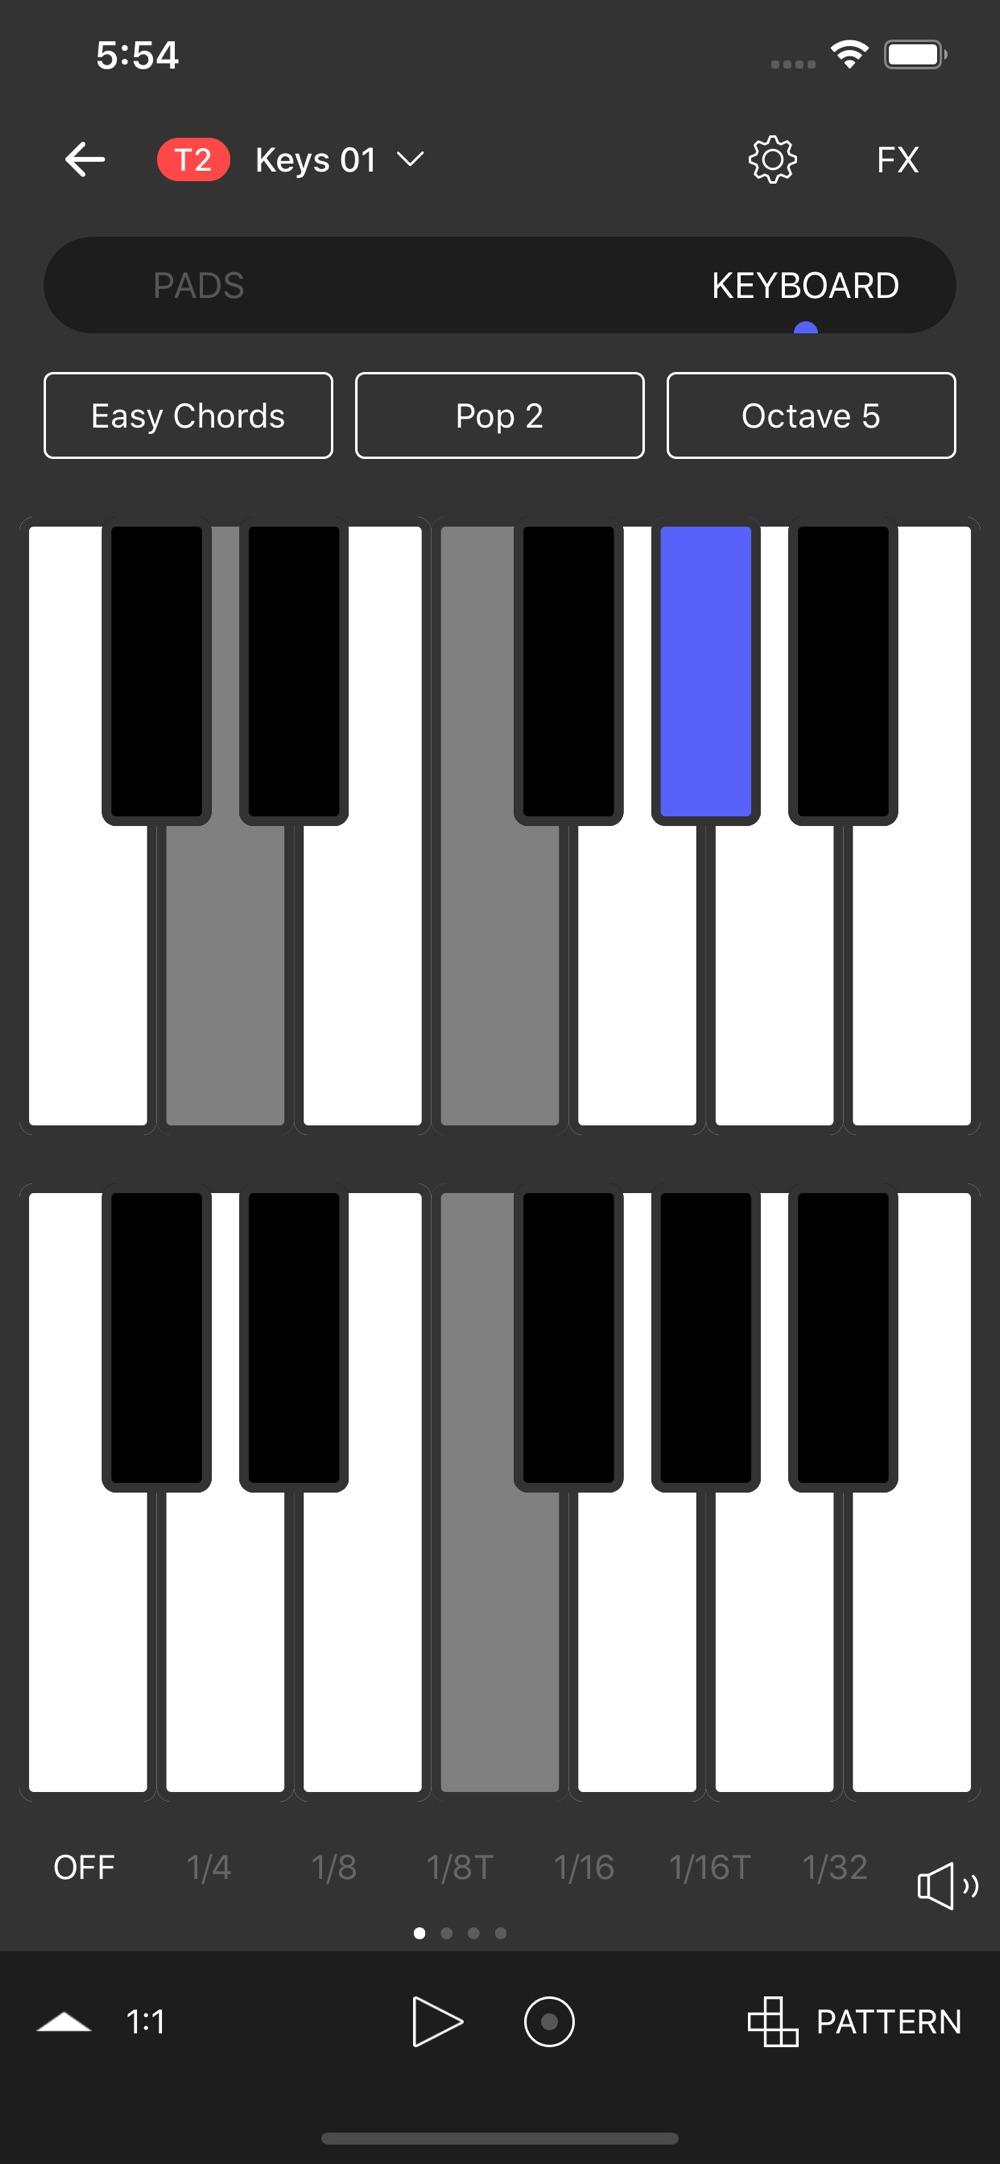 TIZE - Beat Maker, Music Maker hack tool